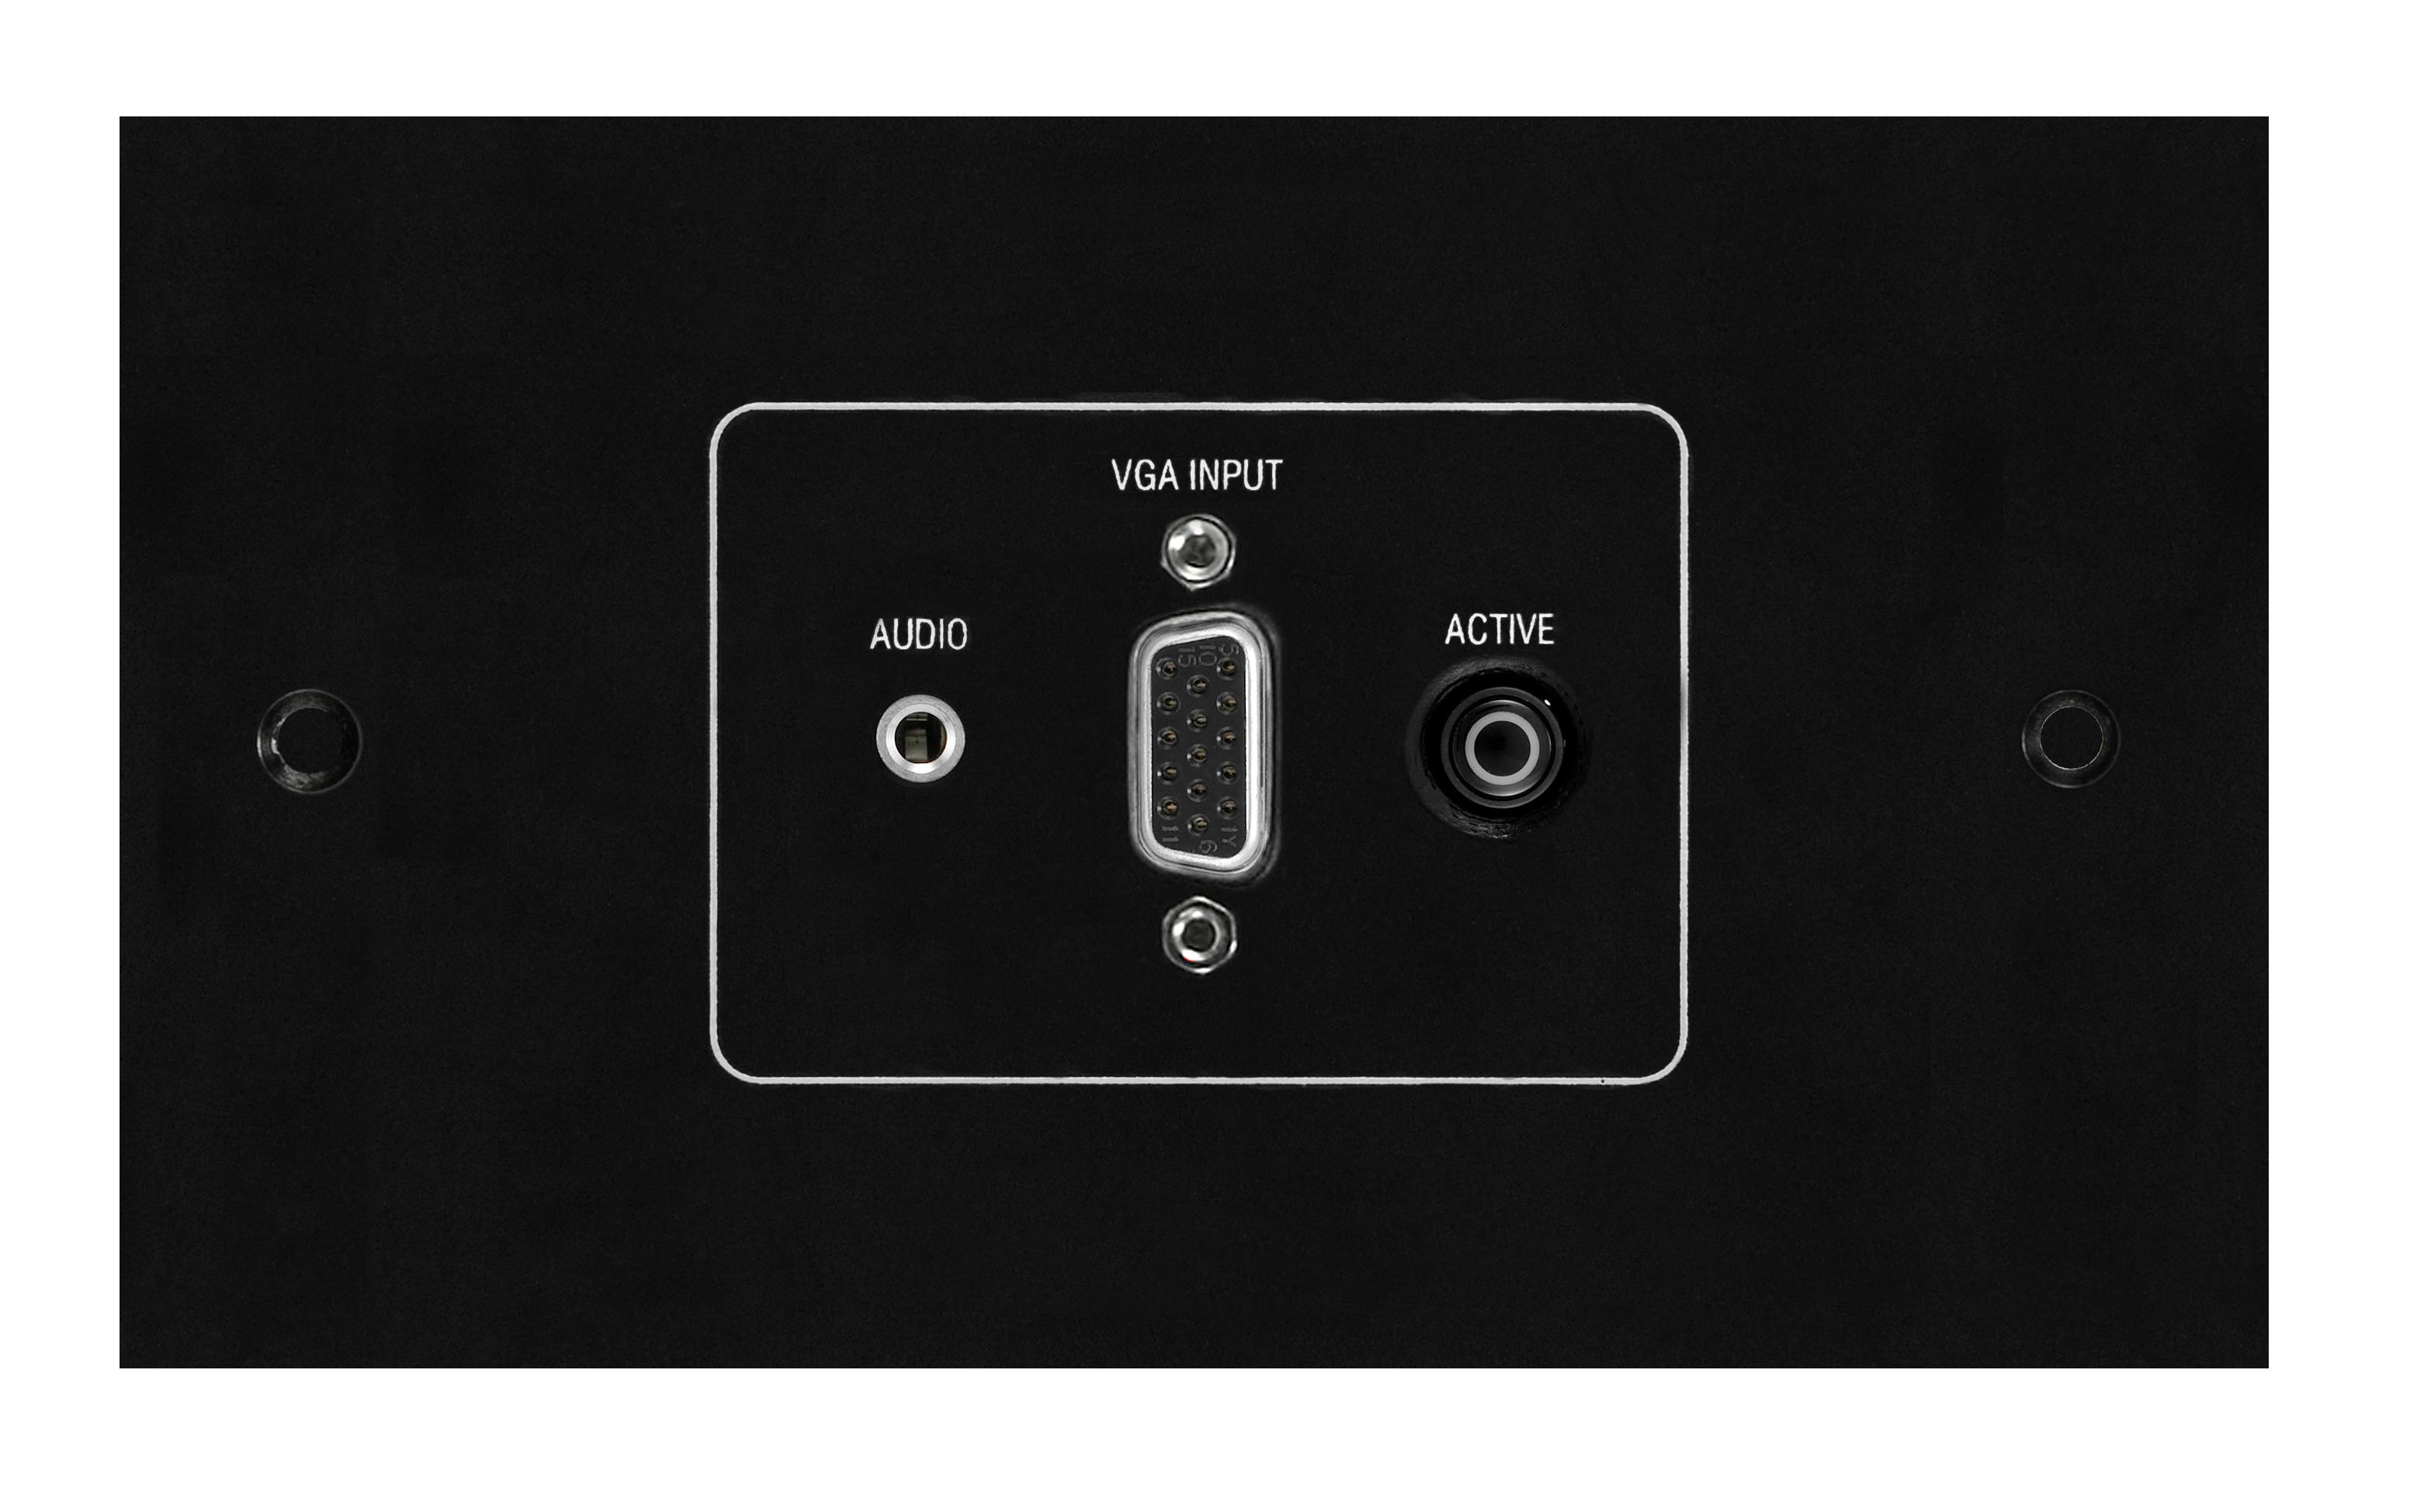 UPX-RGB+A-UK-B - Front